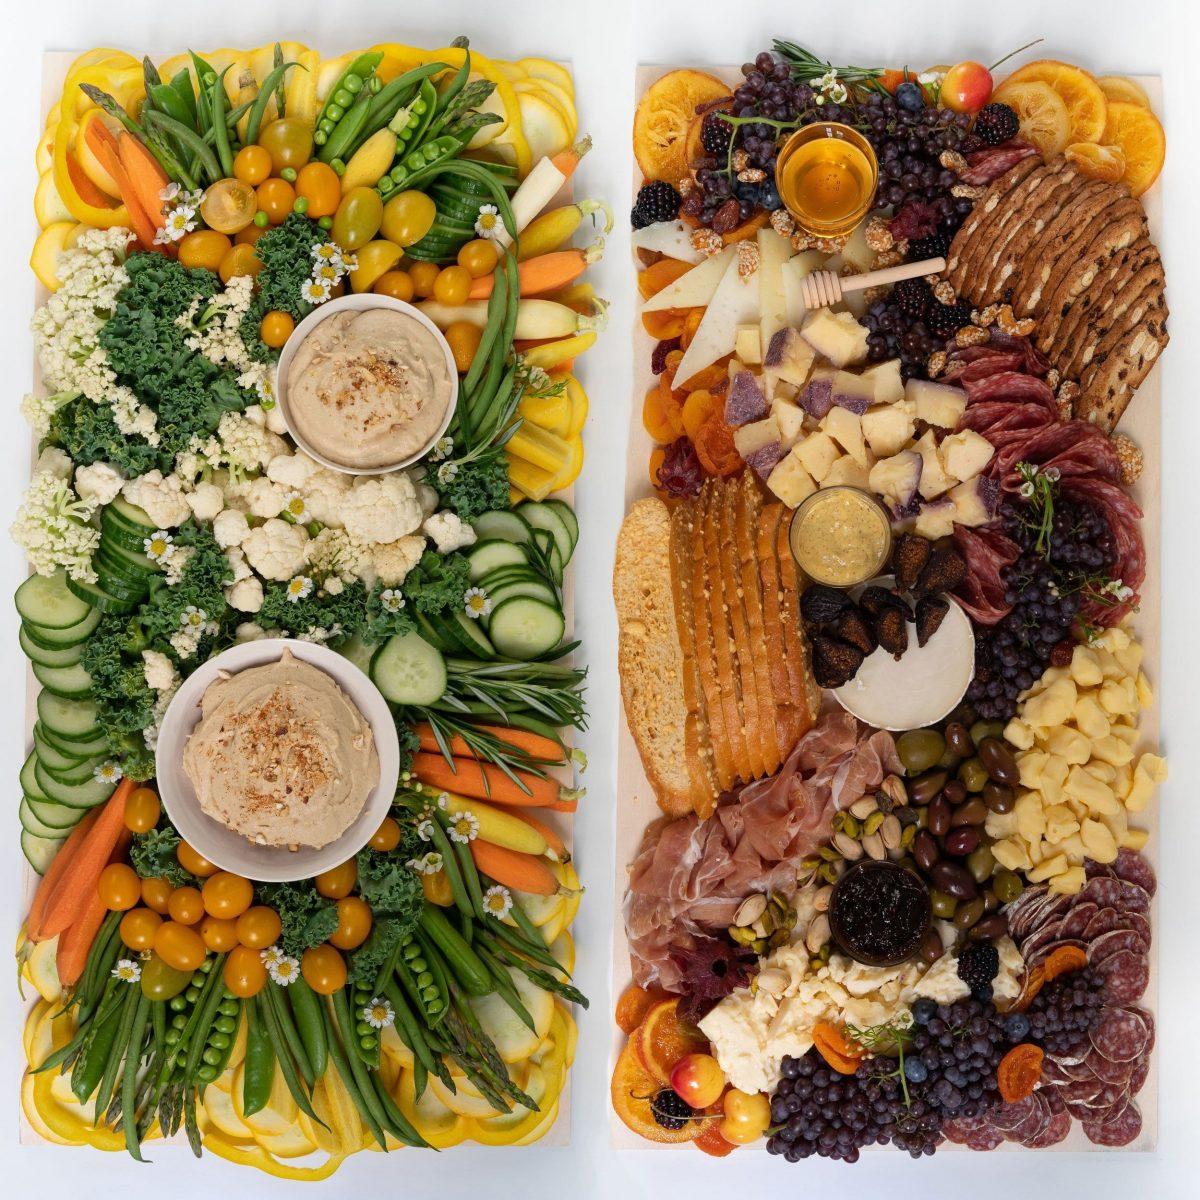 Darcy Miller, Darcy Miller Designs, Graze New York, Food, Party Food, Graze board